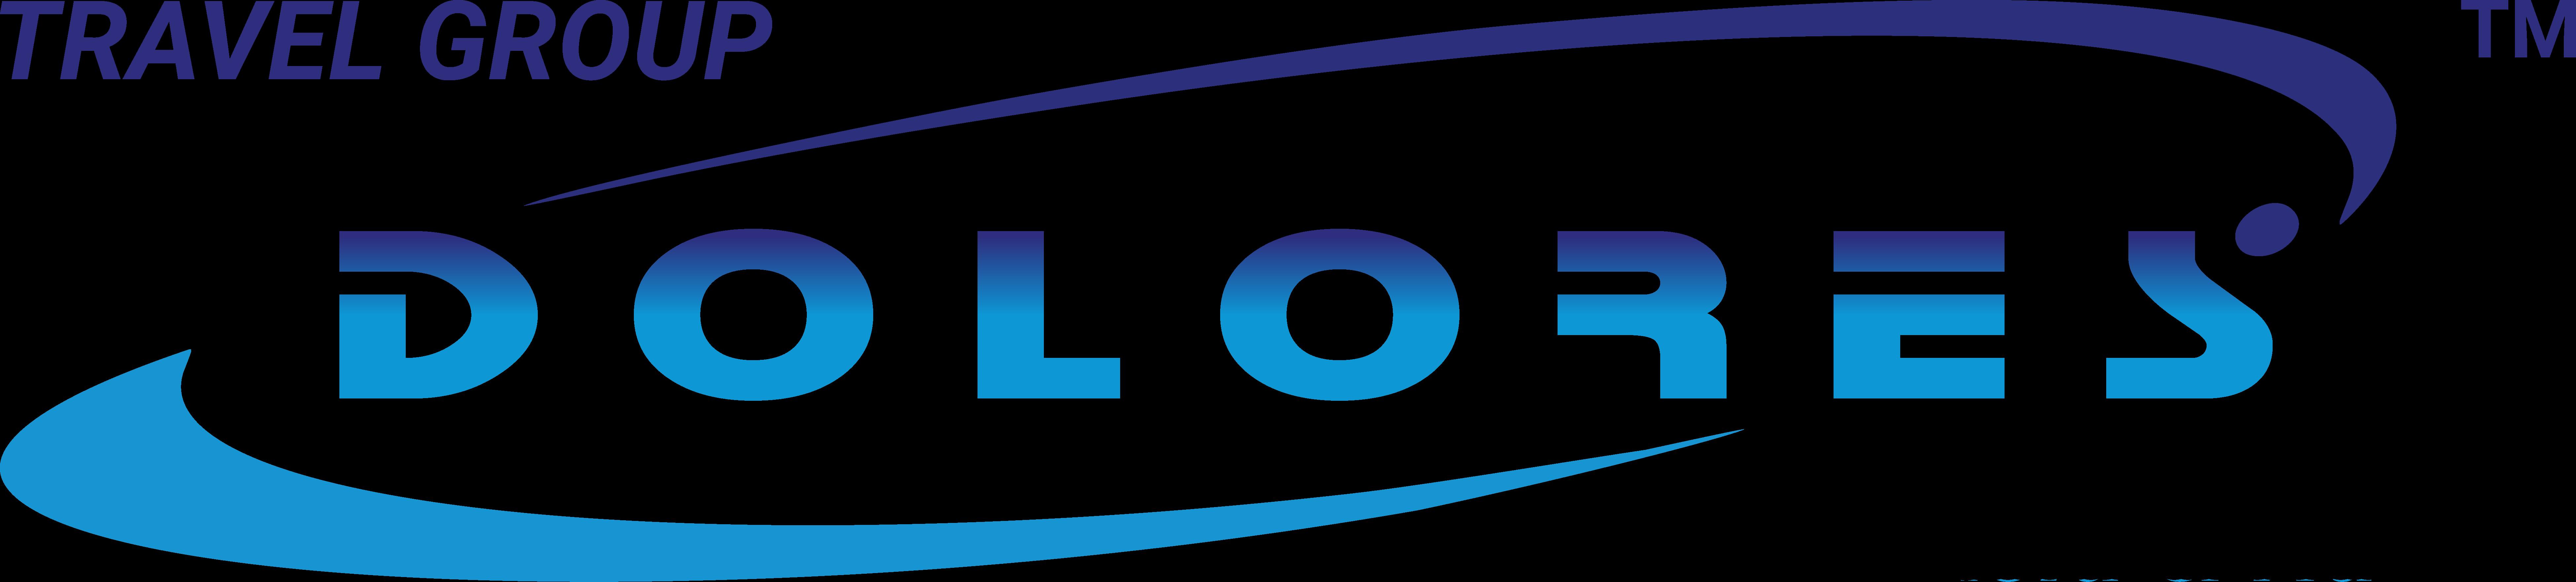 Dolores Travel Services